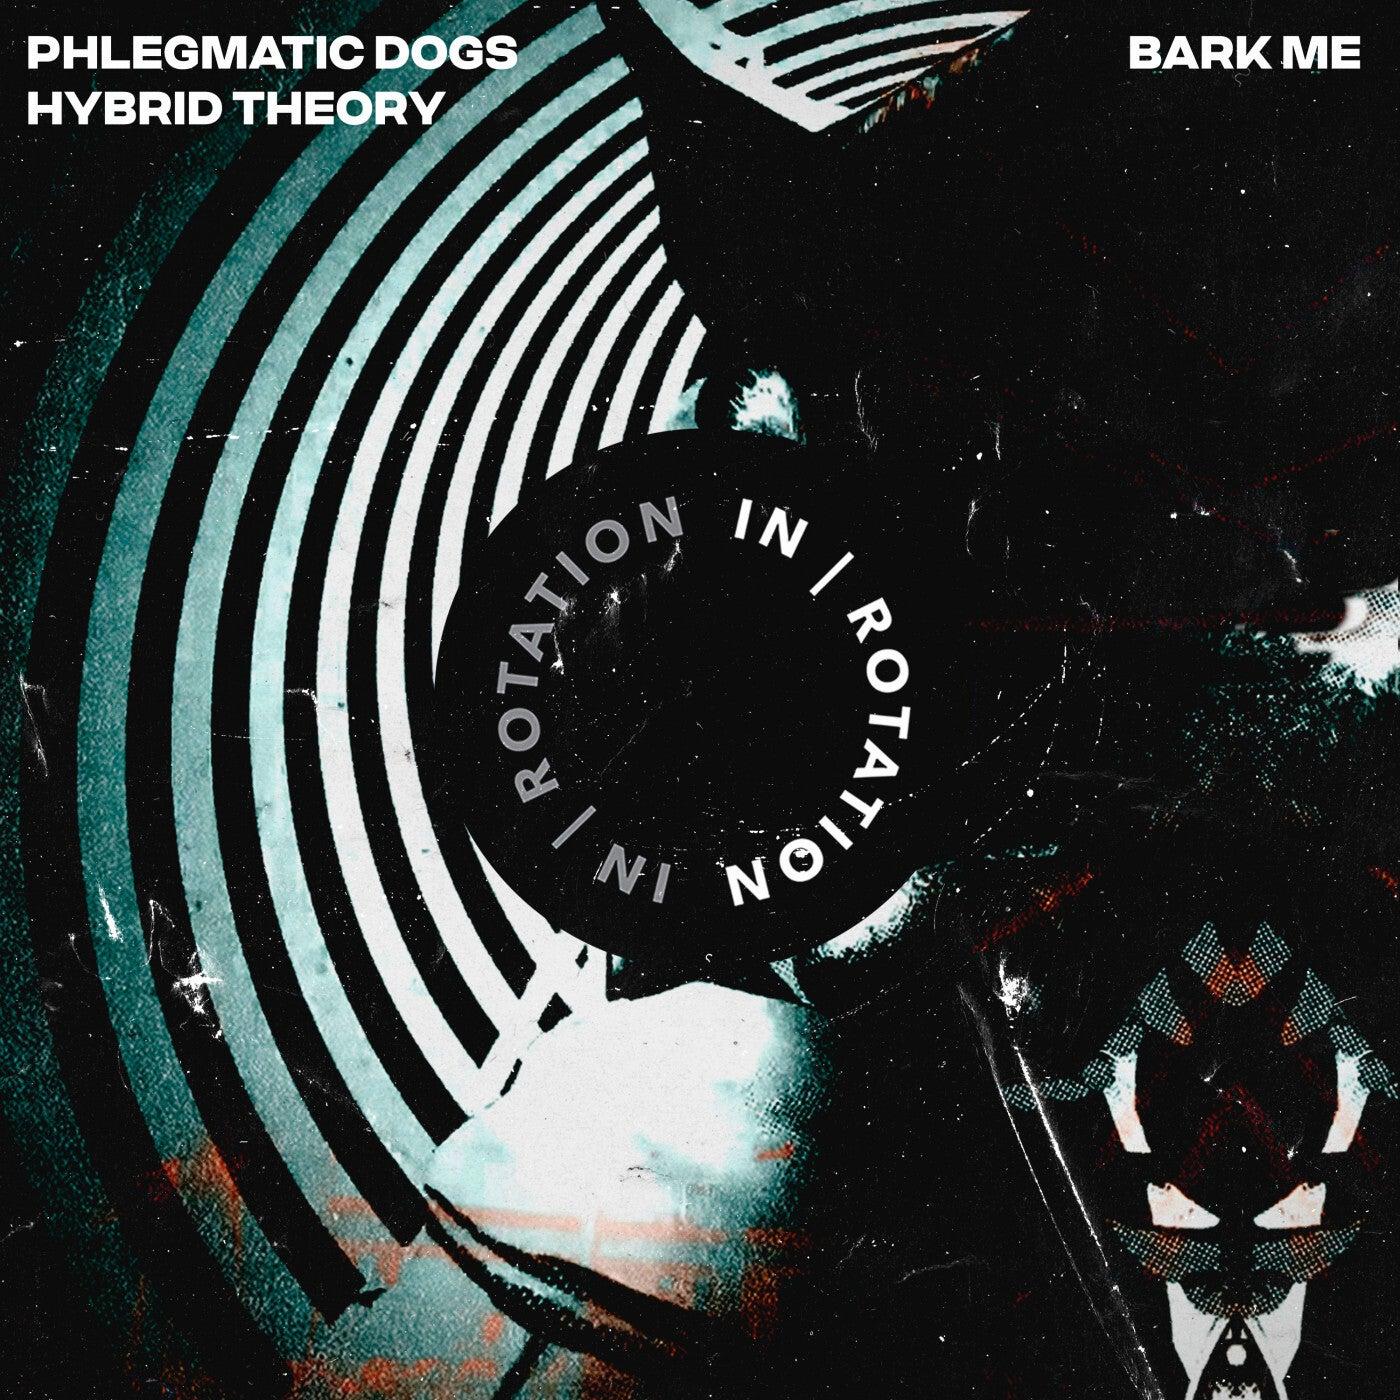 Bark Me (Original Mix)